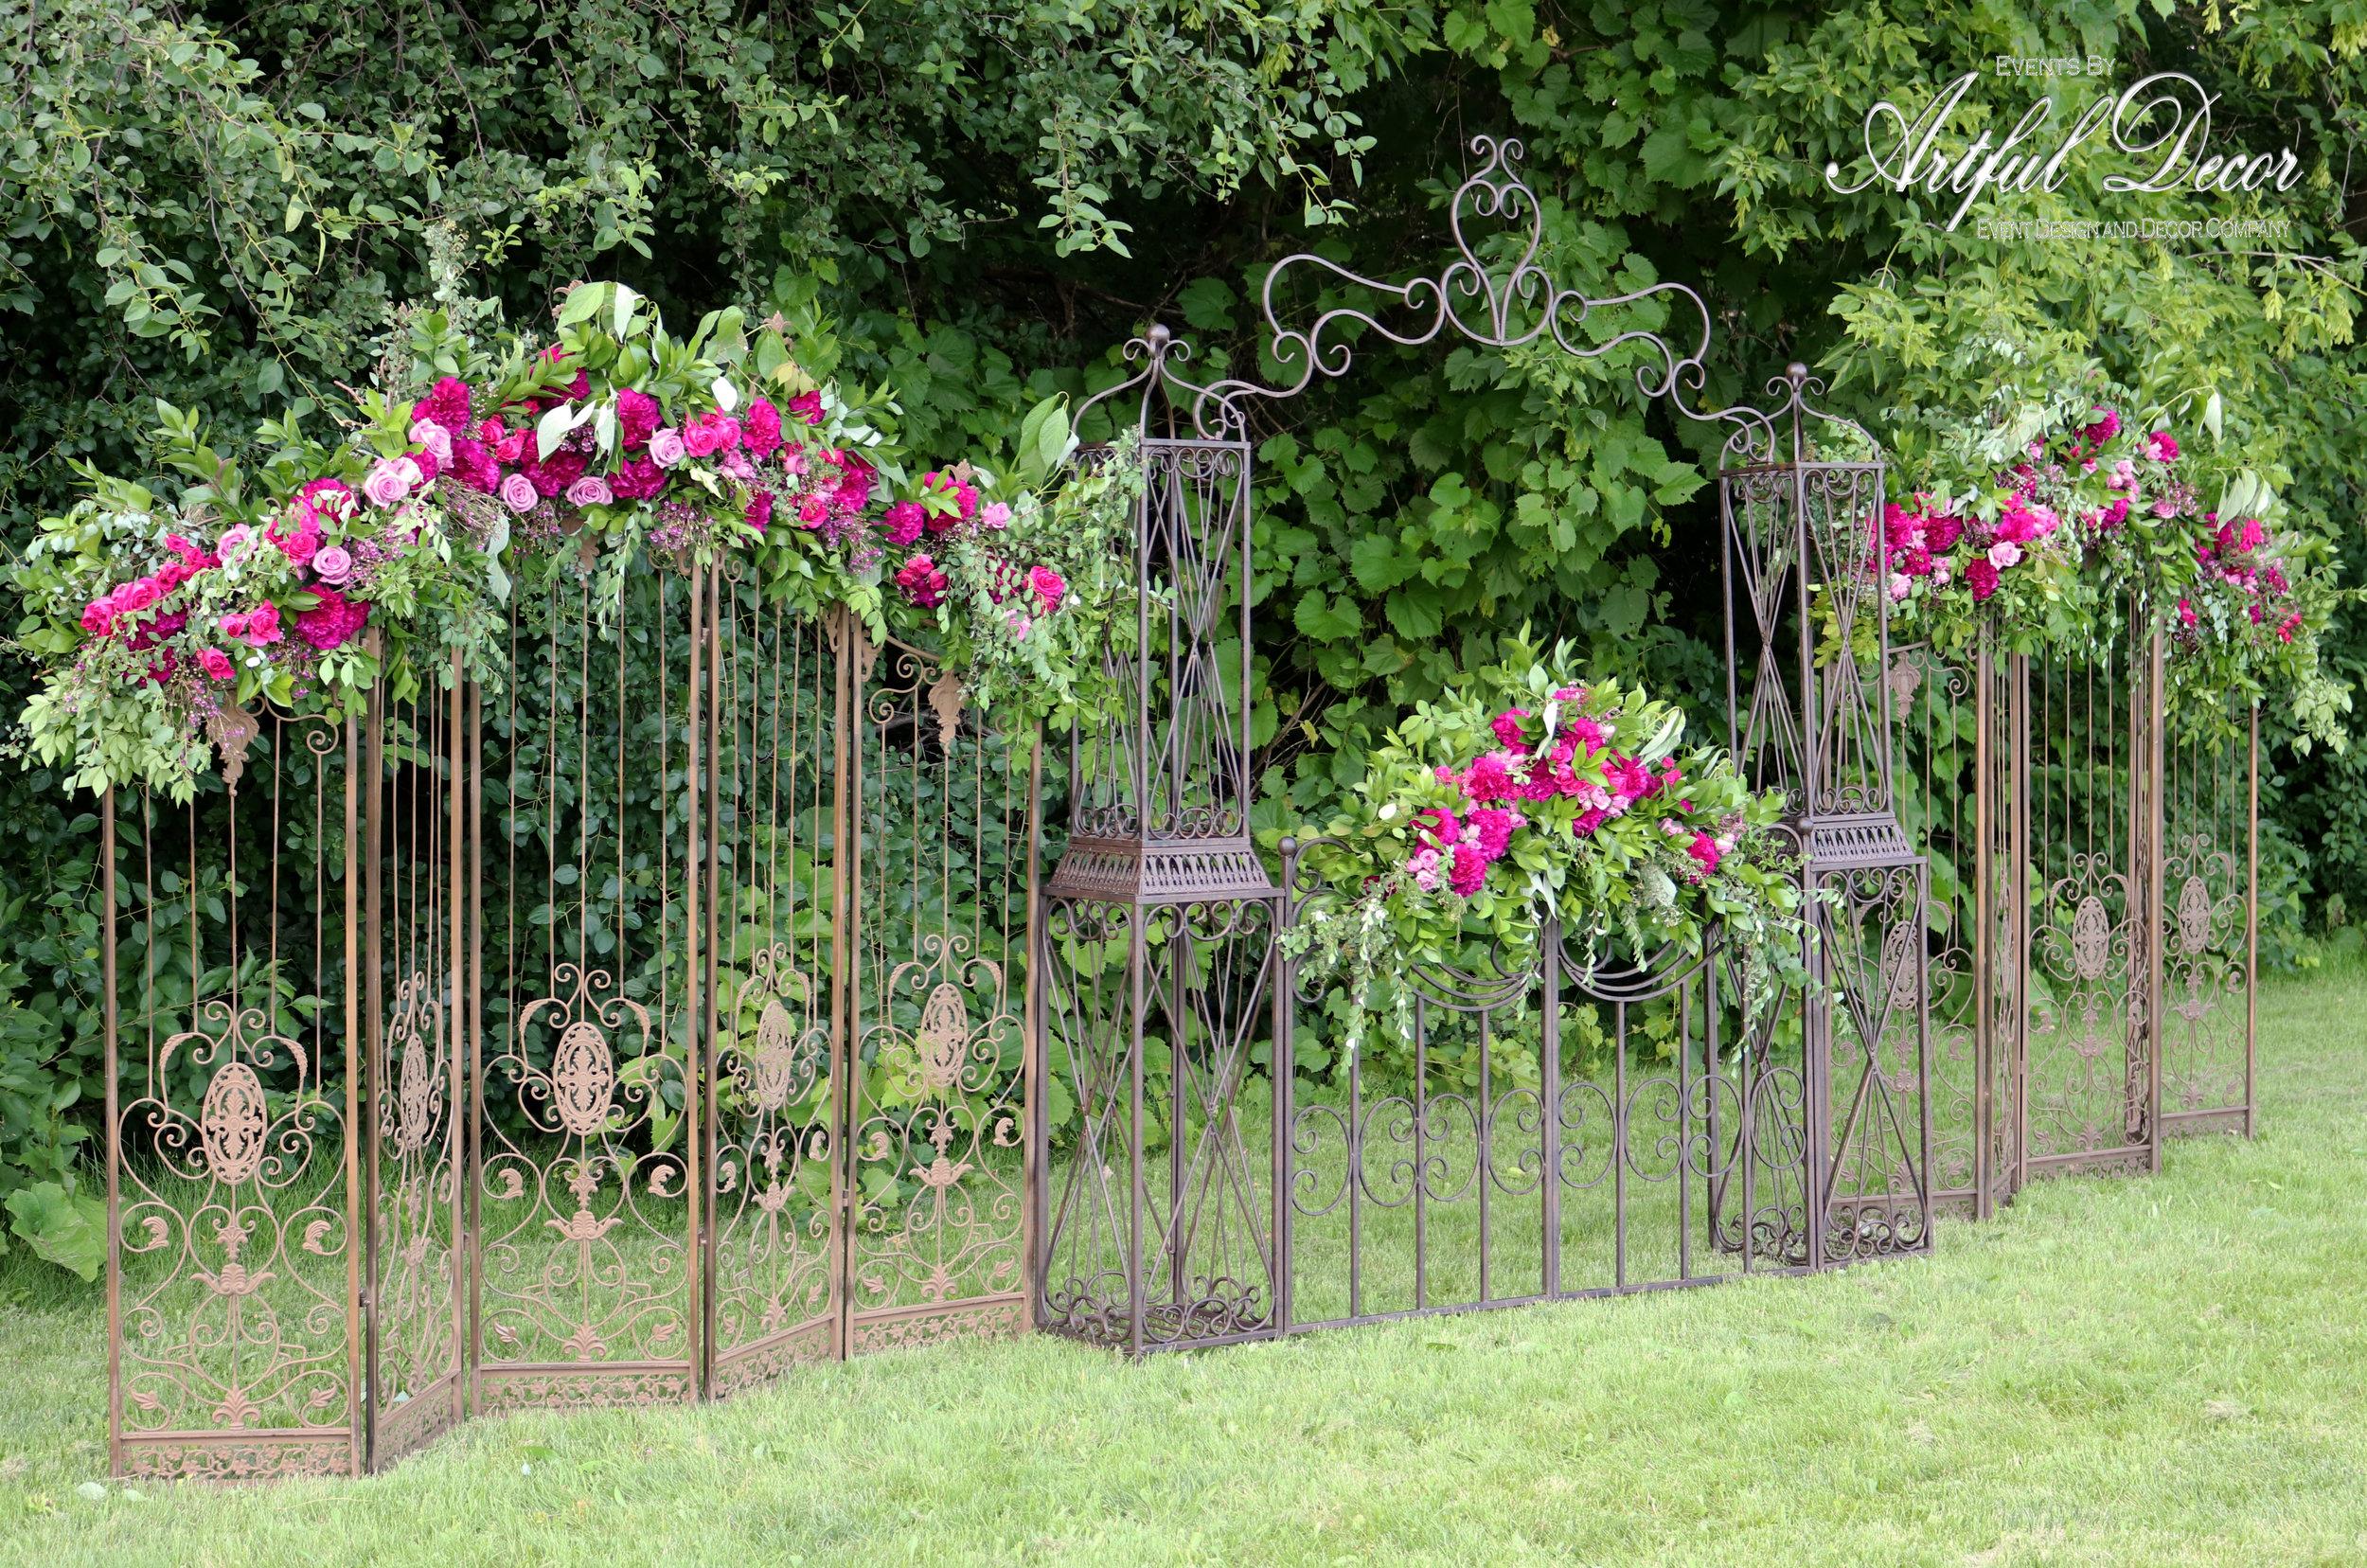 Garden Gate 5 Copyright.jpg